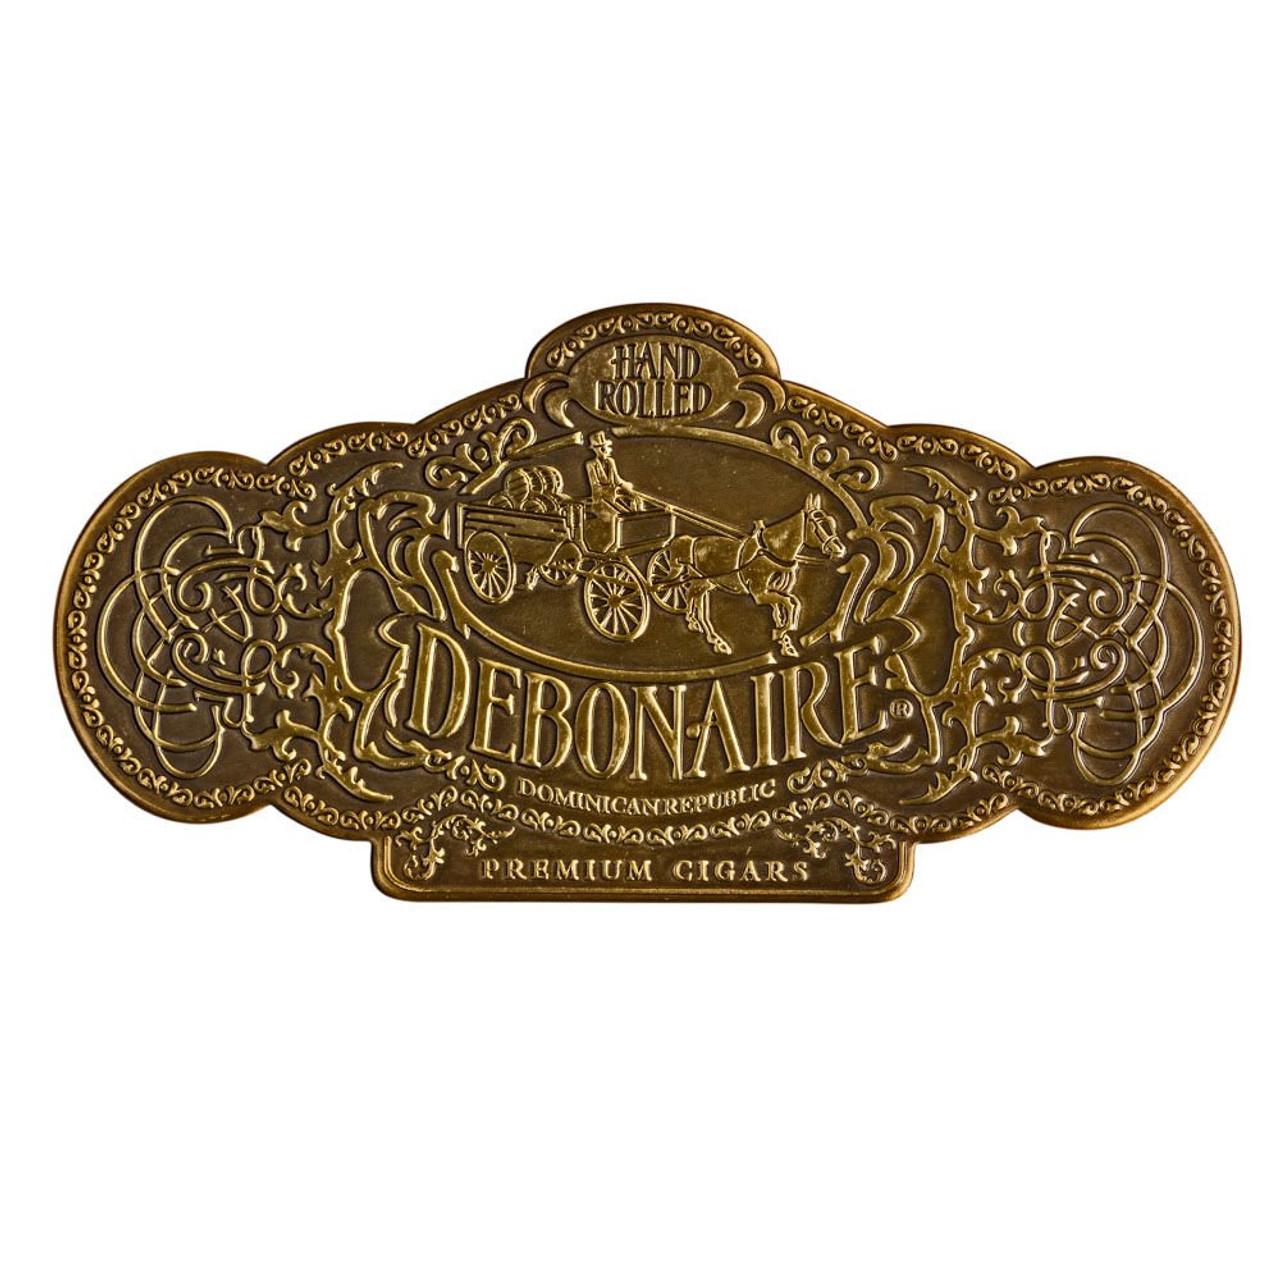 Debonaire Maduro Robusto Cigars - 5.25 x 50 (Box of 20)